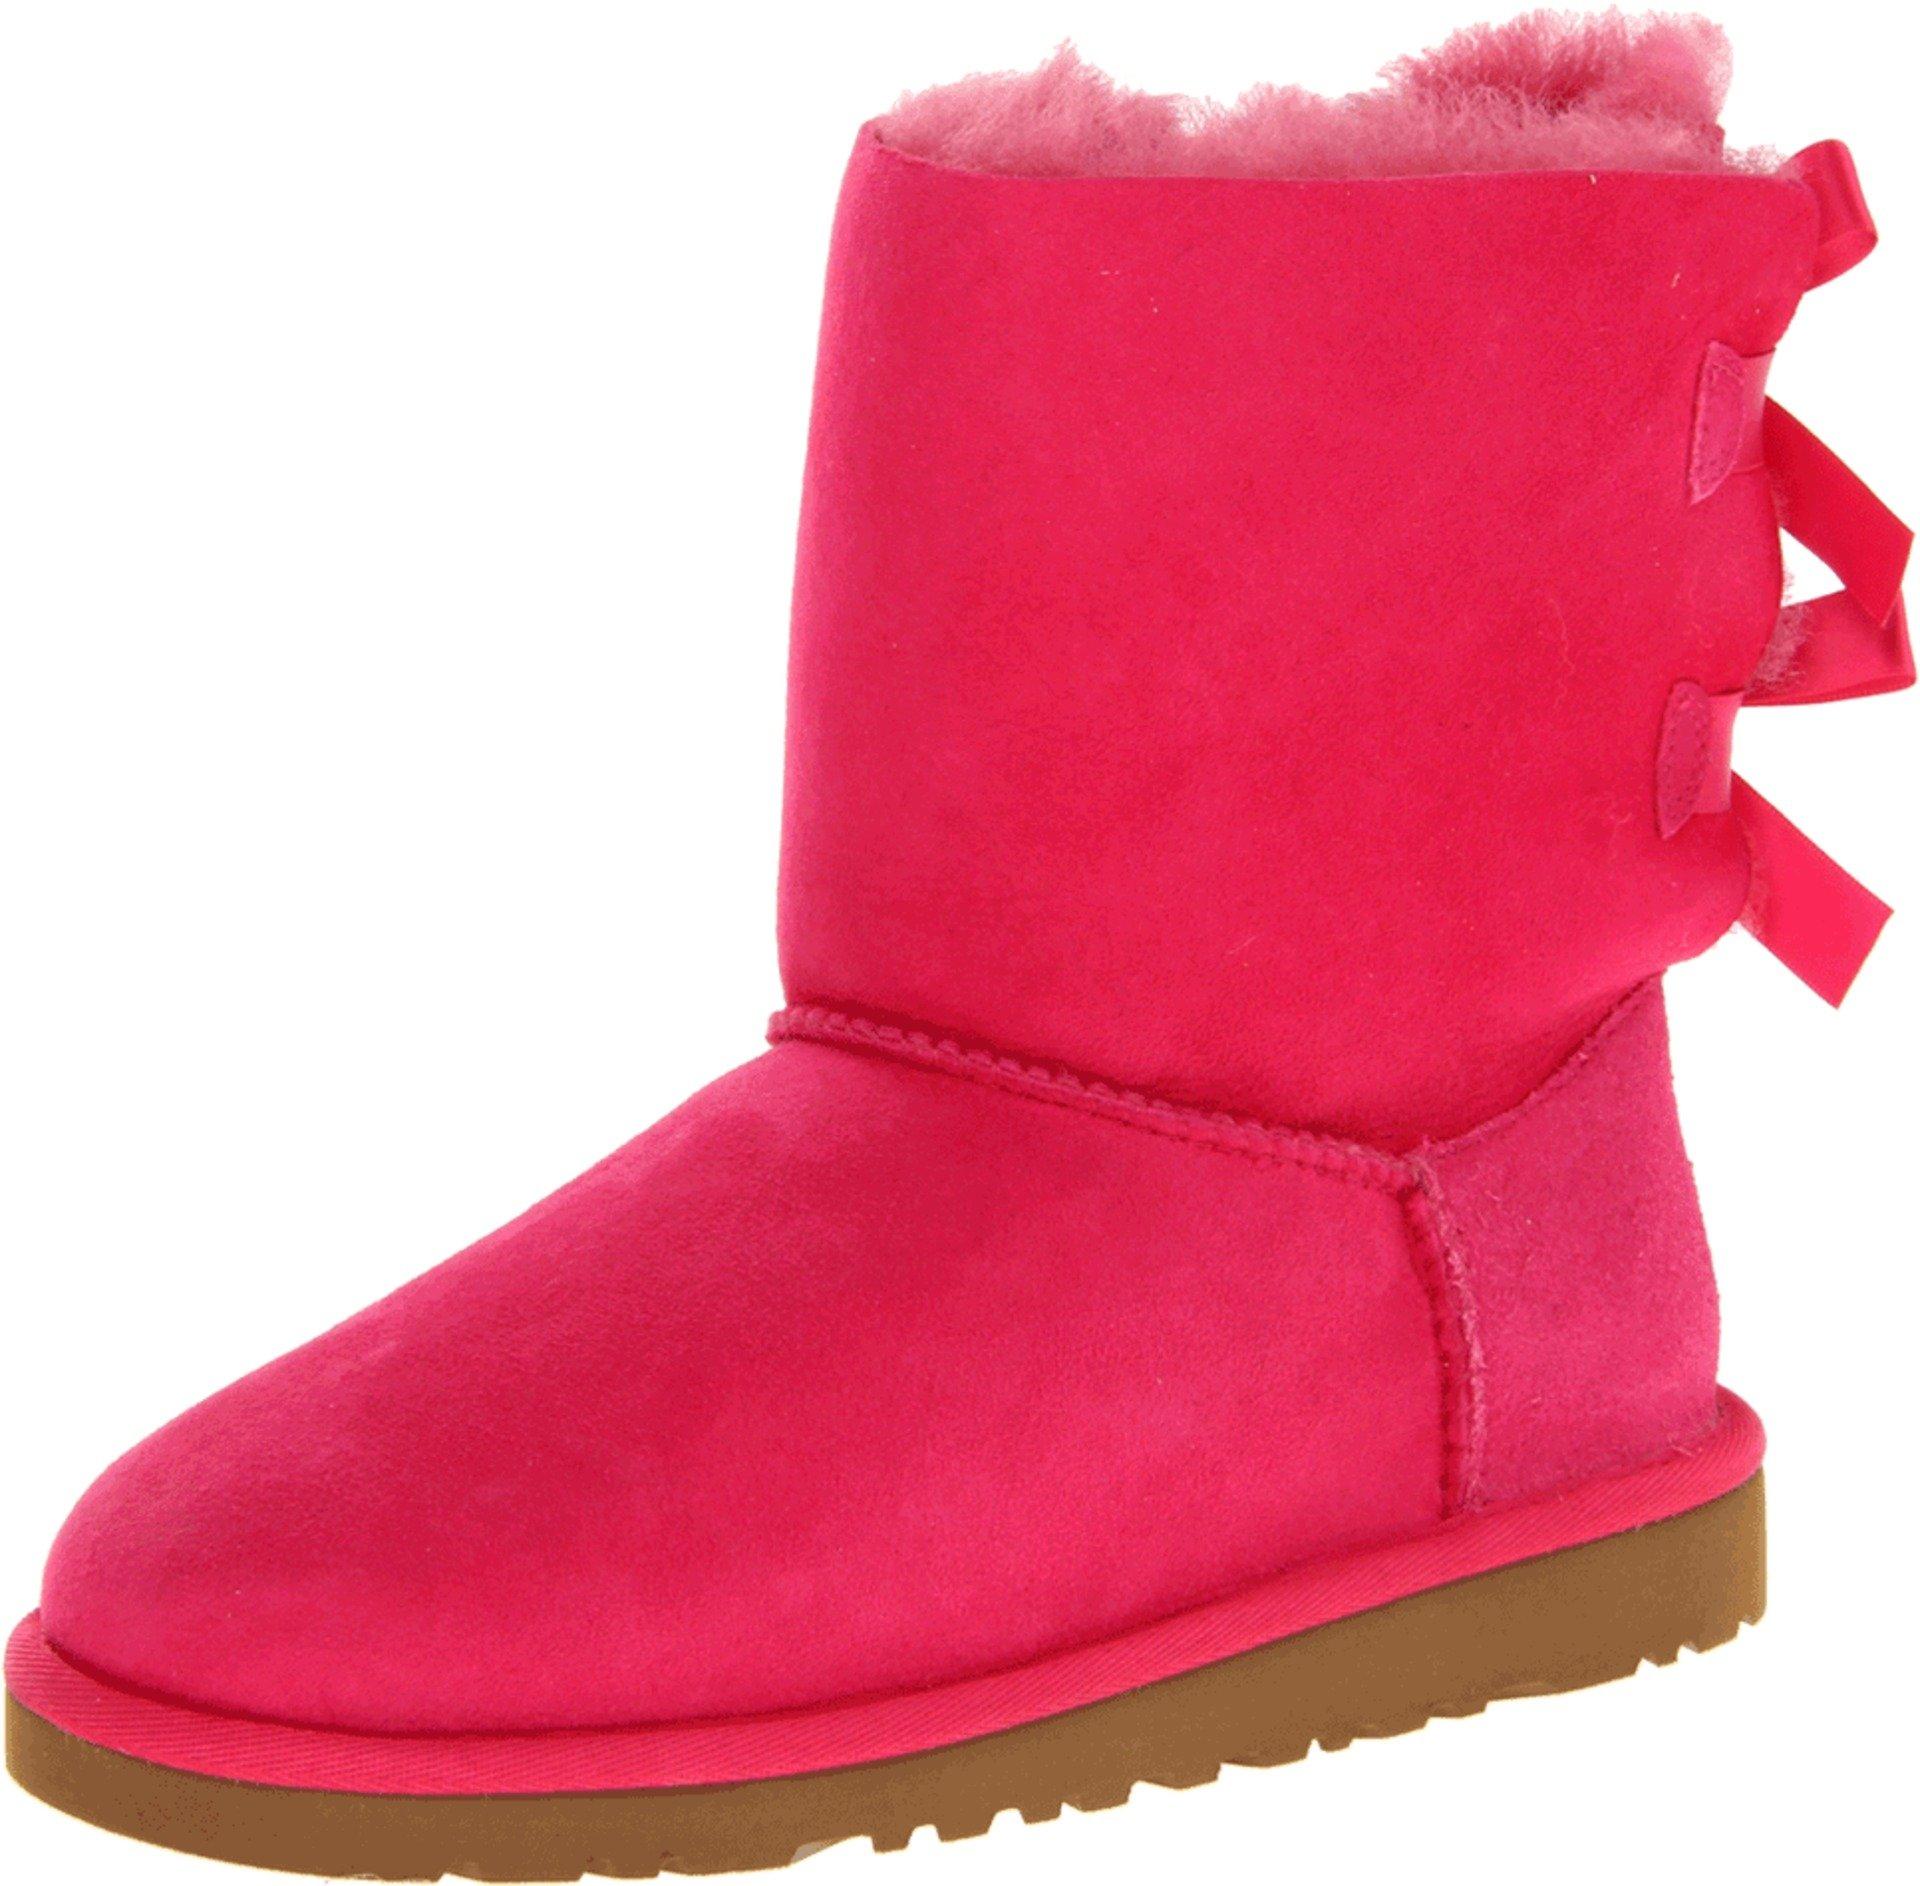 UGG Australia Girls Kids Bailey Bow Cerise Winter Boot - 5